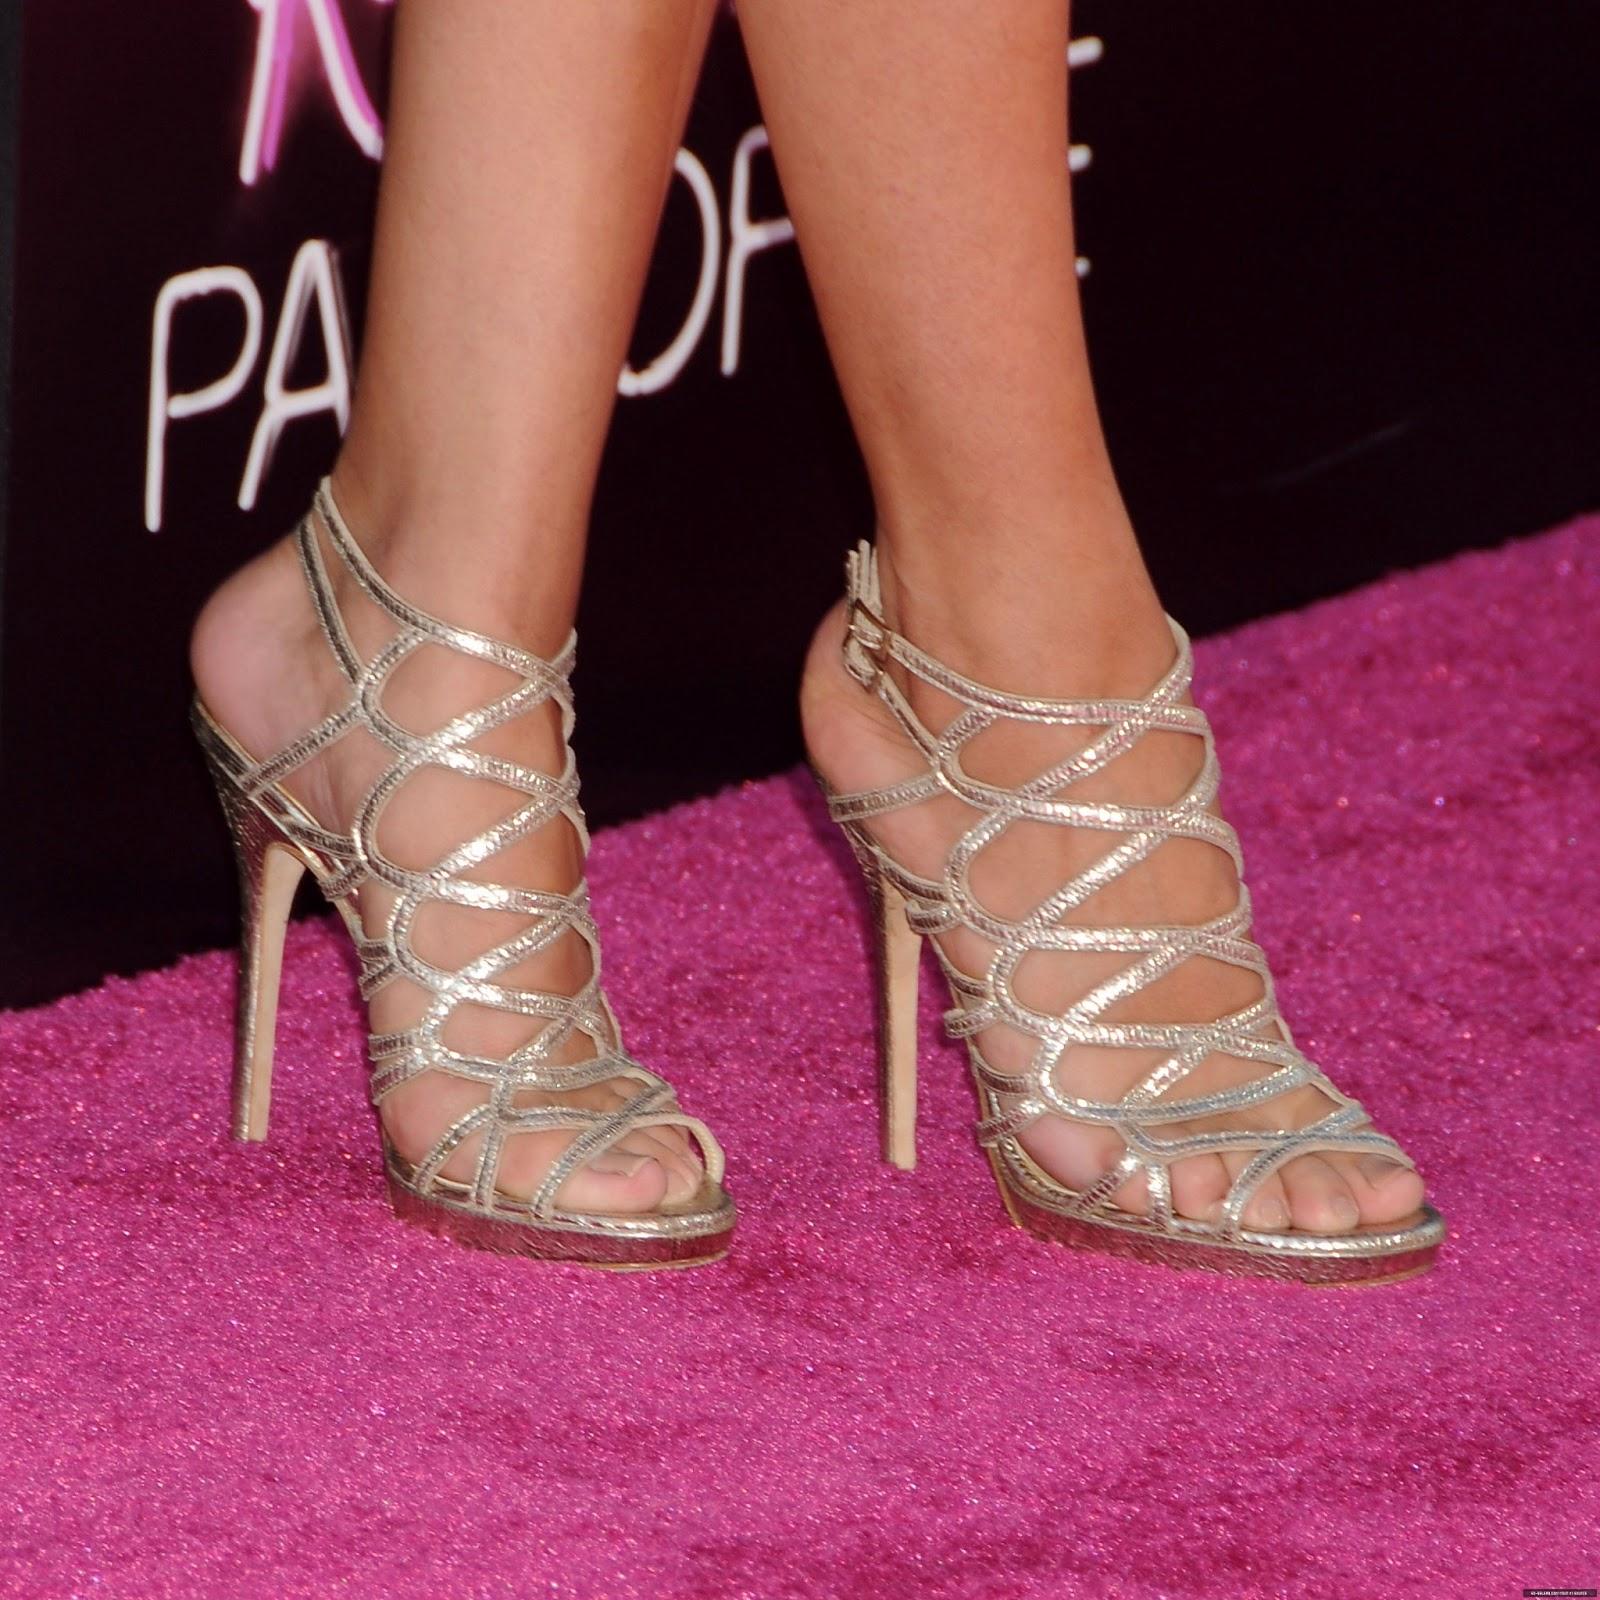 Selena Gomez Hd Feet Photos Sexy Feet Capture - Celebrity -5077